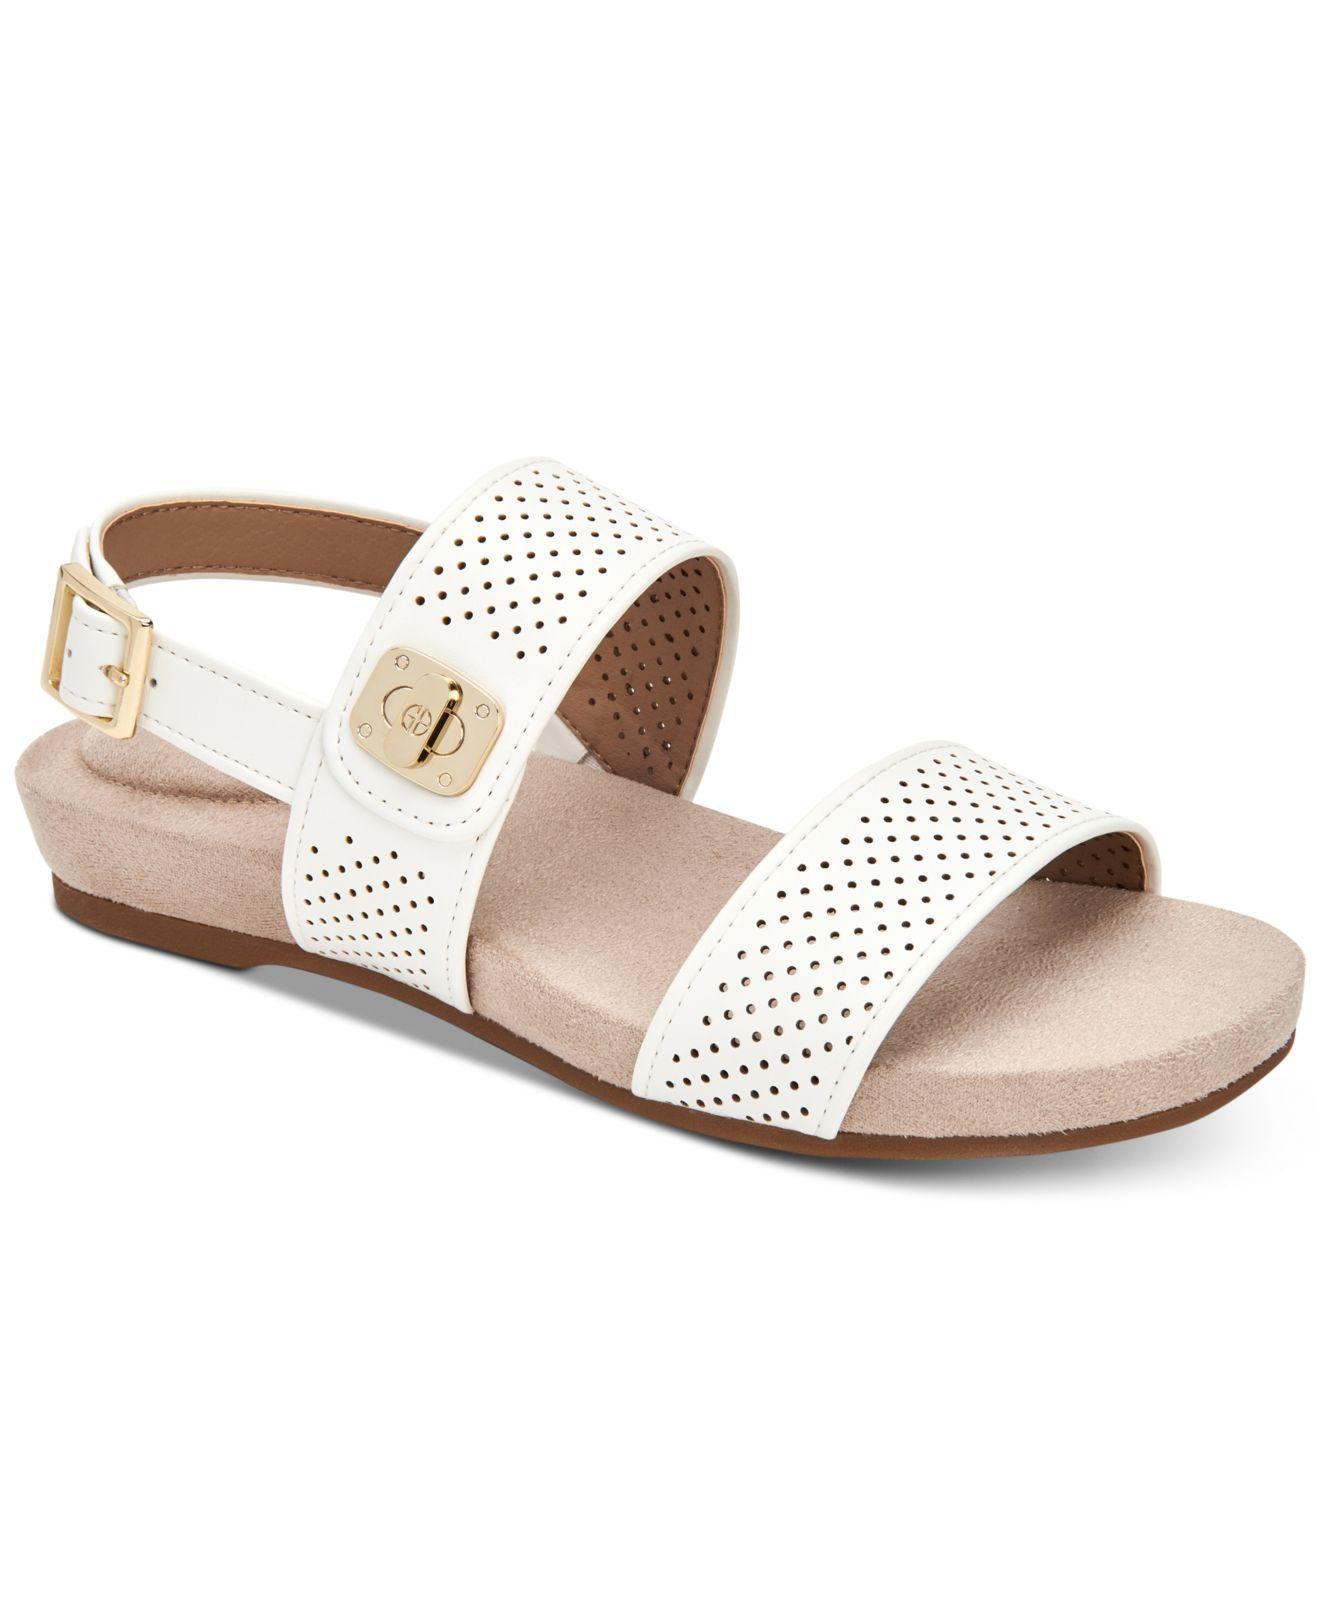 Lyst Giani Bernini Ramonaa Memory Foam Footbed Sandals